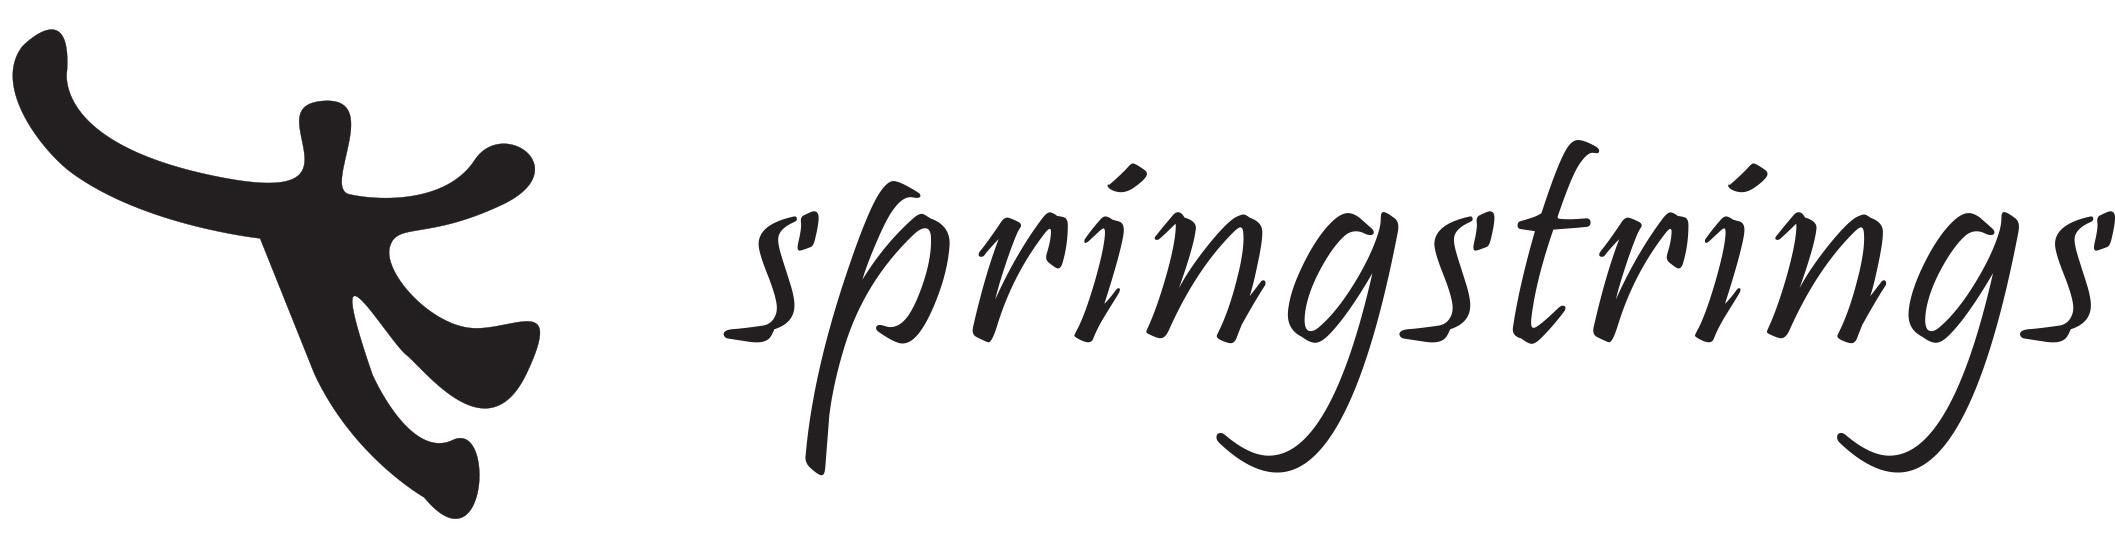 SPRING_STRINGS